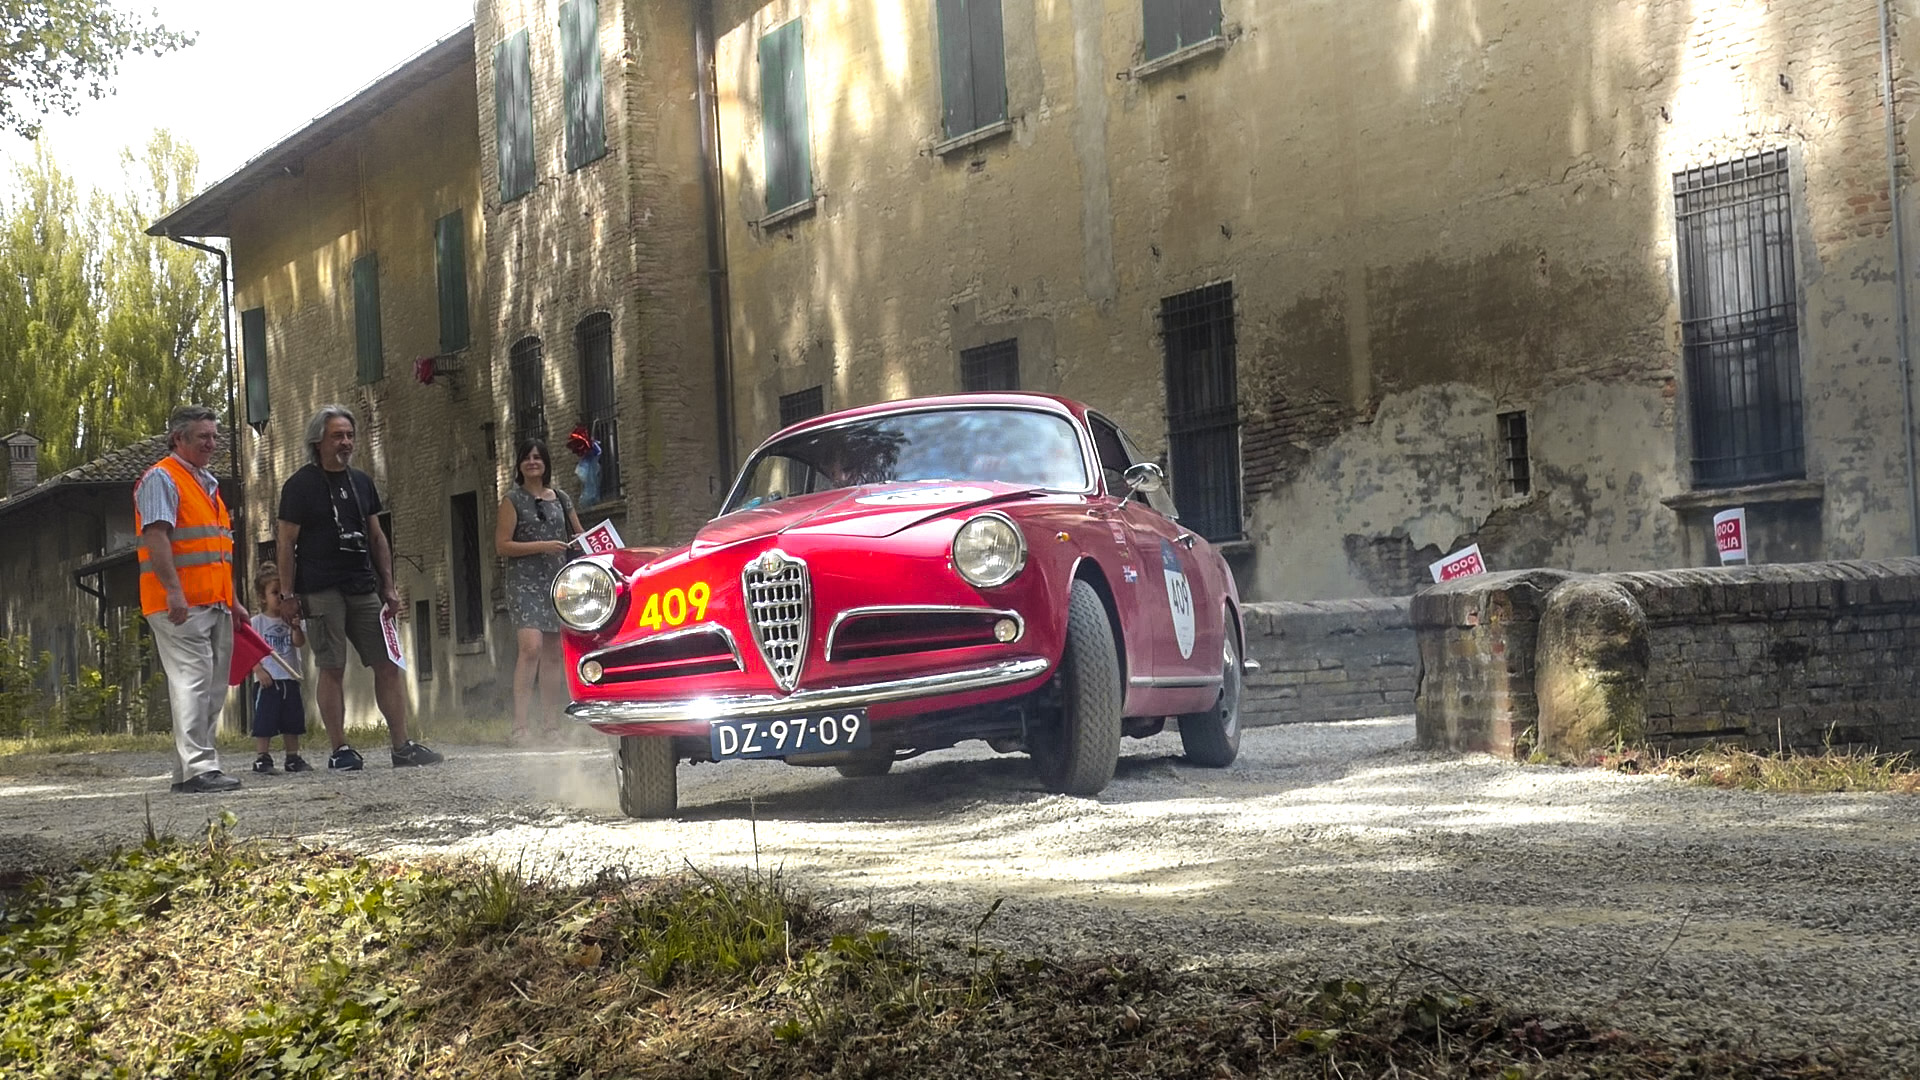 Alfa Romeo Giulietta Sprint - DZ-97-09 (NL)